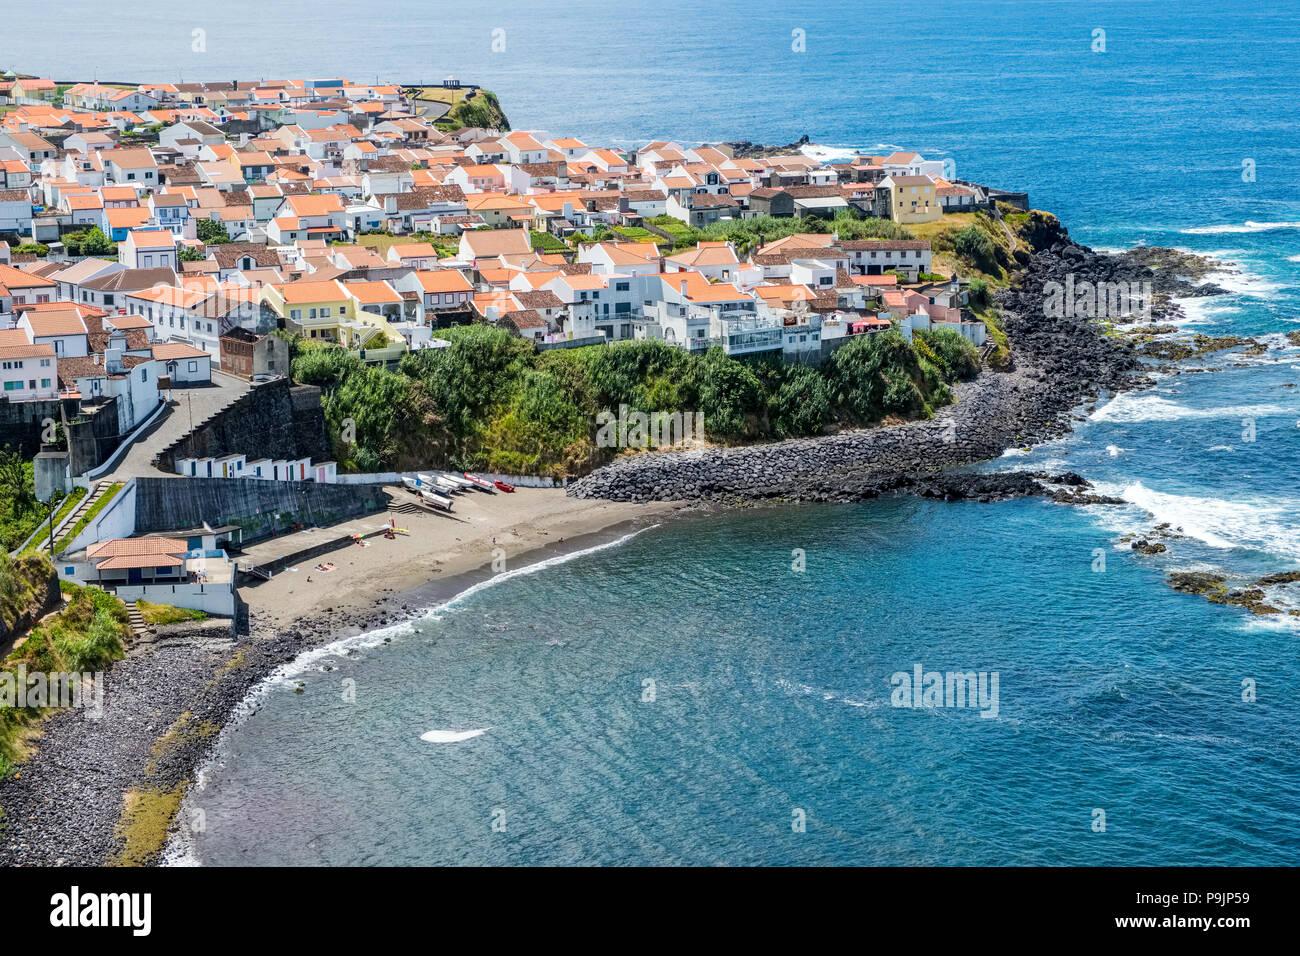 The coastal village of Maia on the north coast of Sao Miguel, Azores - Stock Image